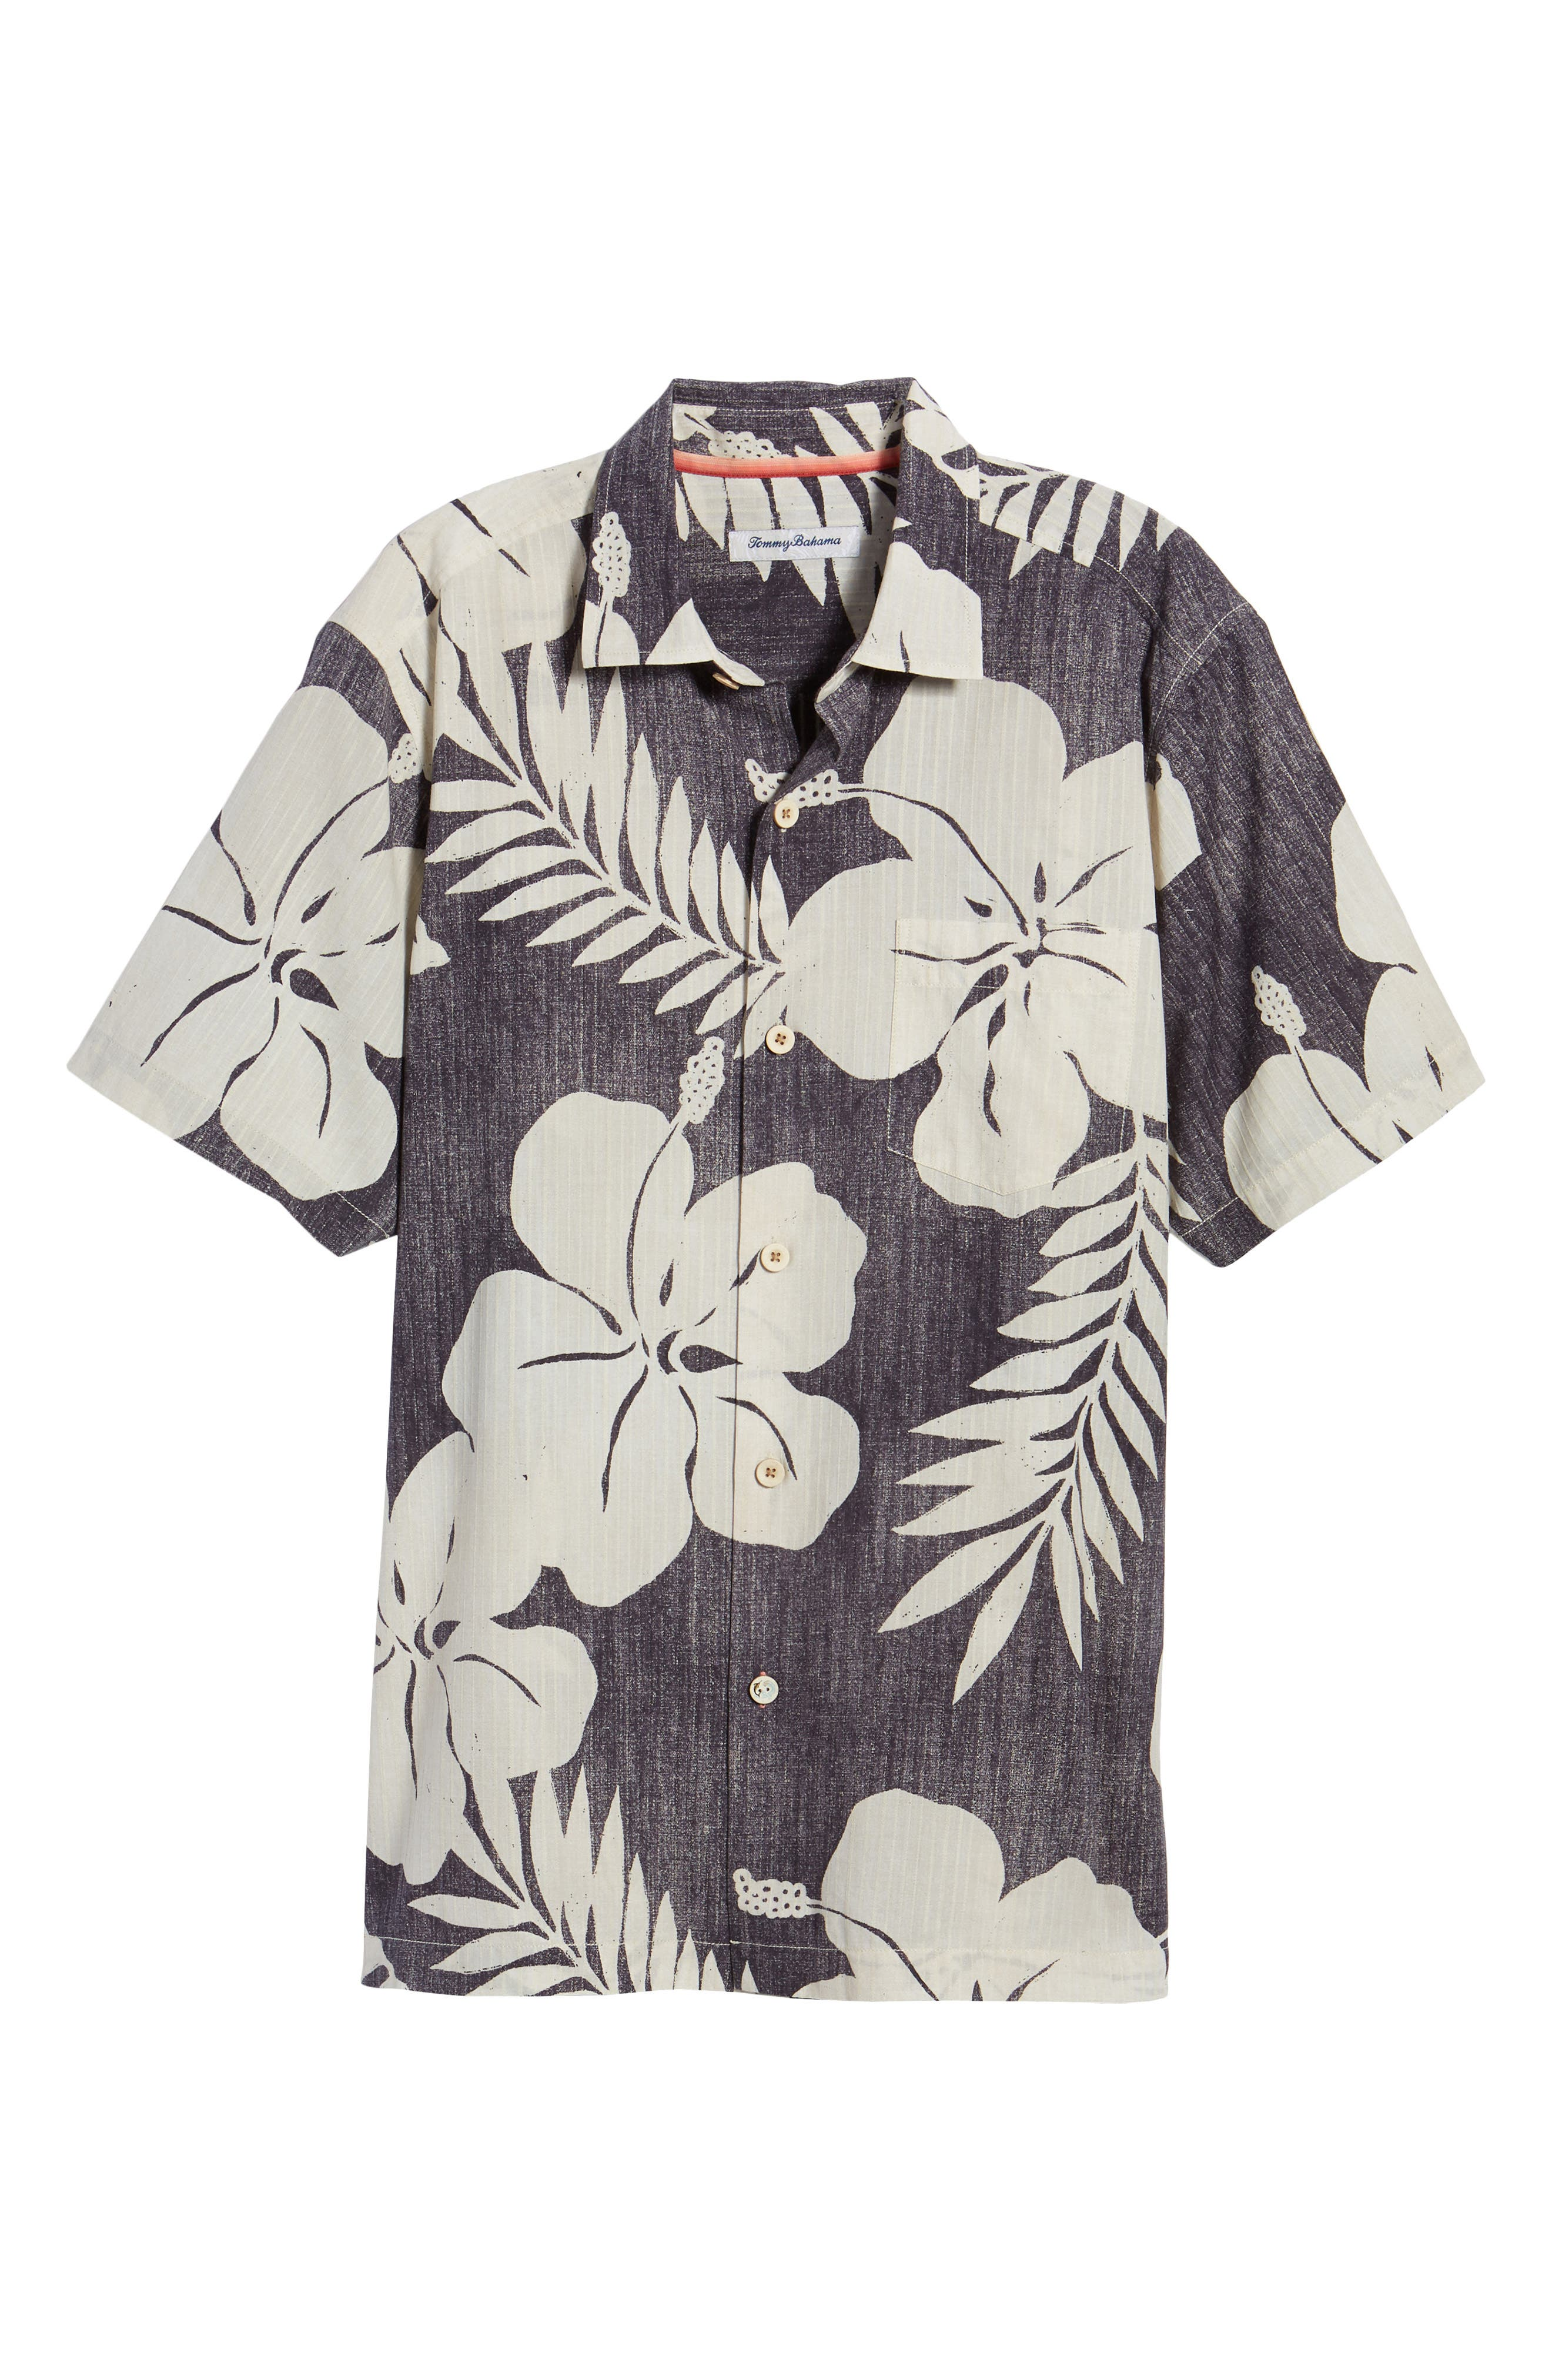 Hialeah Hibiscus Camp Shirt,                             Alternate thumbnail 6, color,                             020